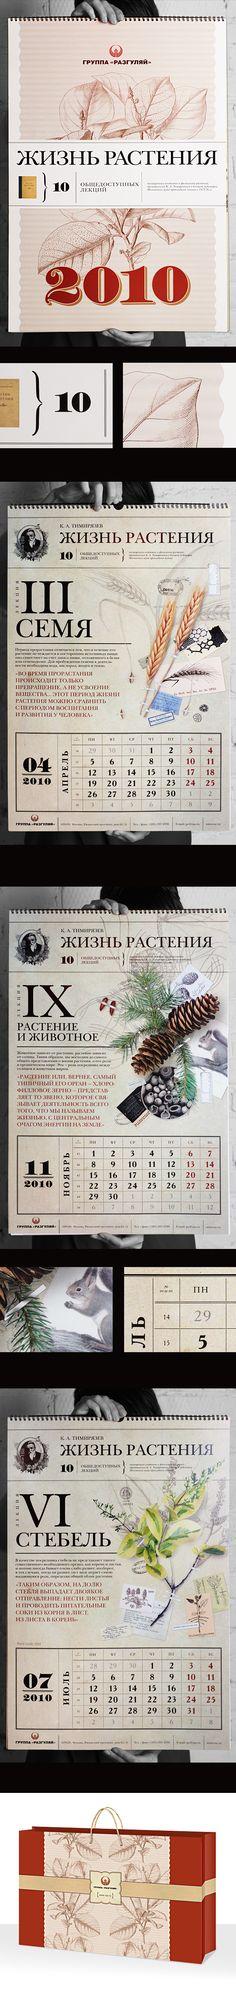 calendar for Razgulay Group by Nika Levitskaya, via Behance